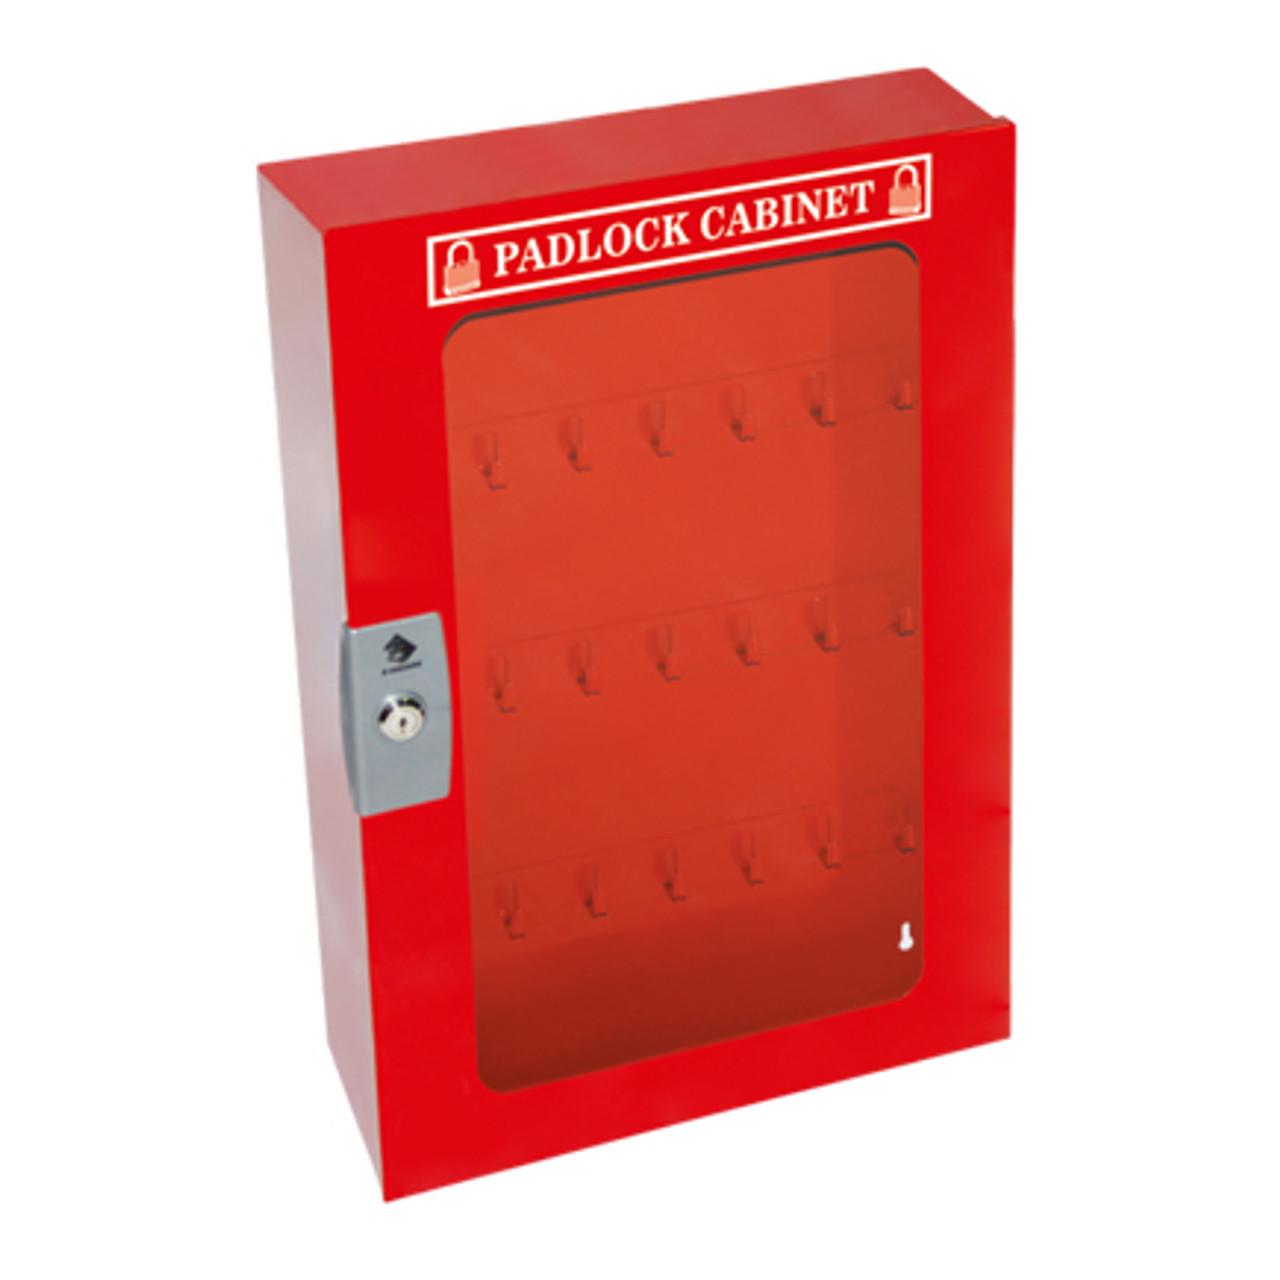 Padlock Cabinet, Red Steel, 84 Padlock Capacity